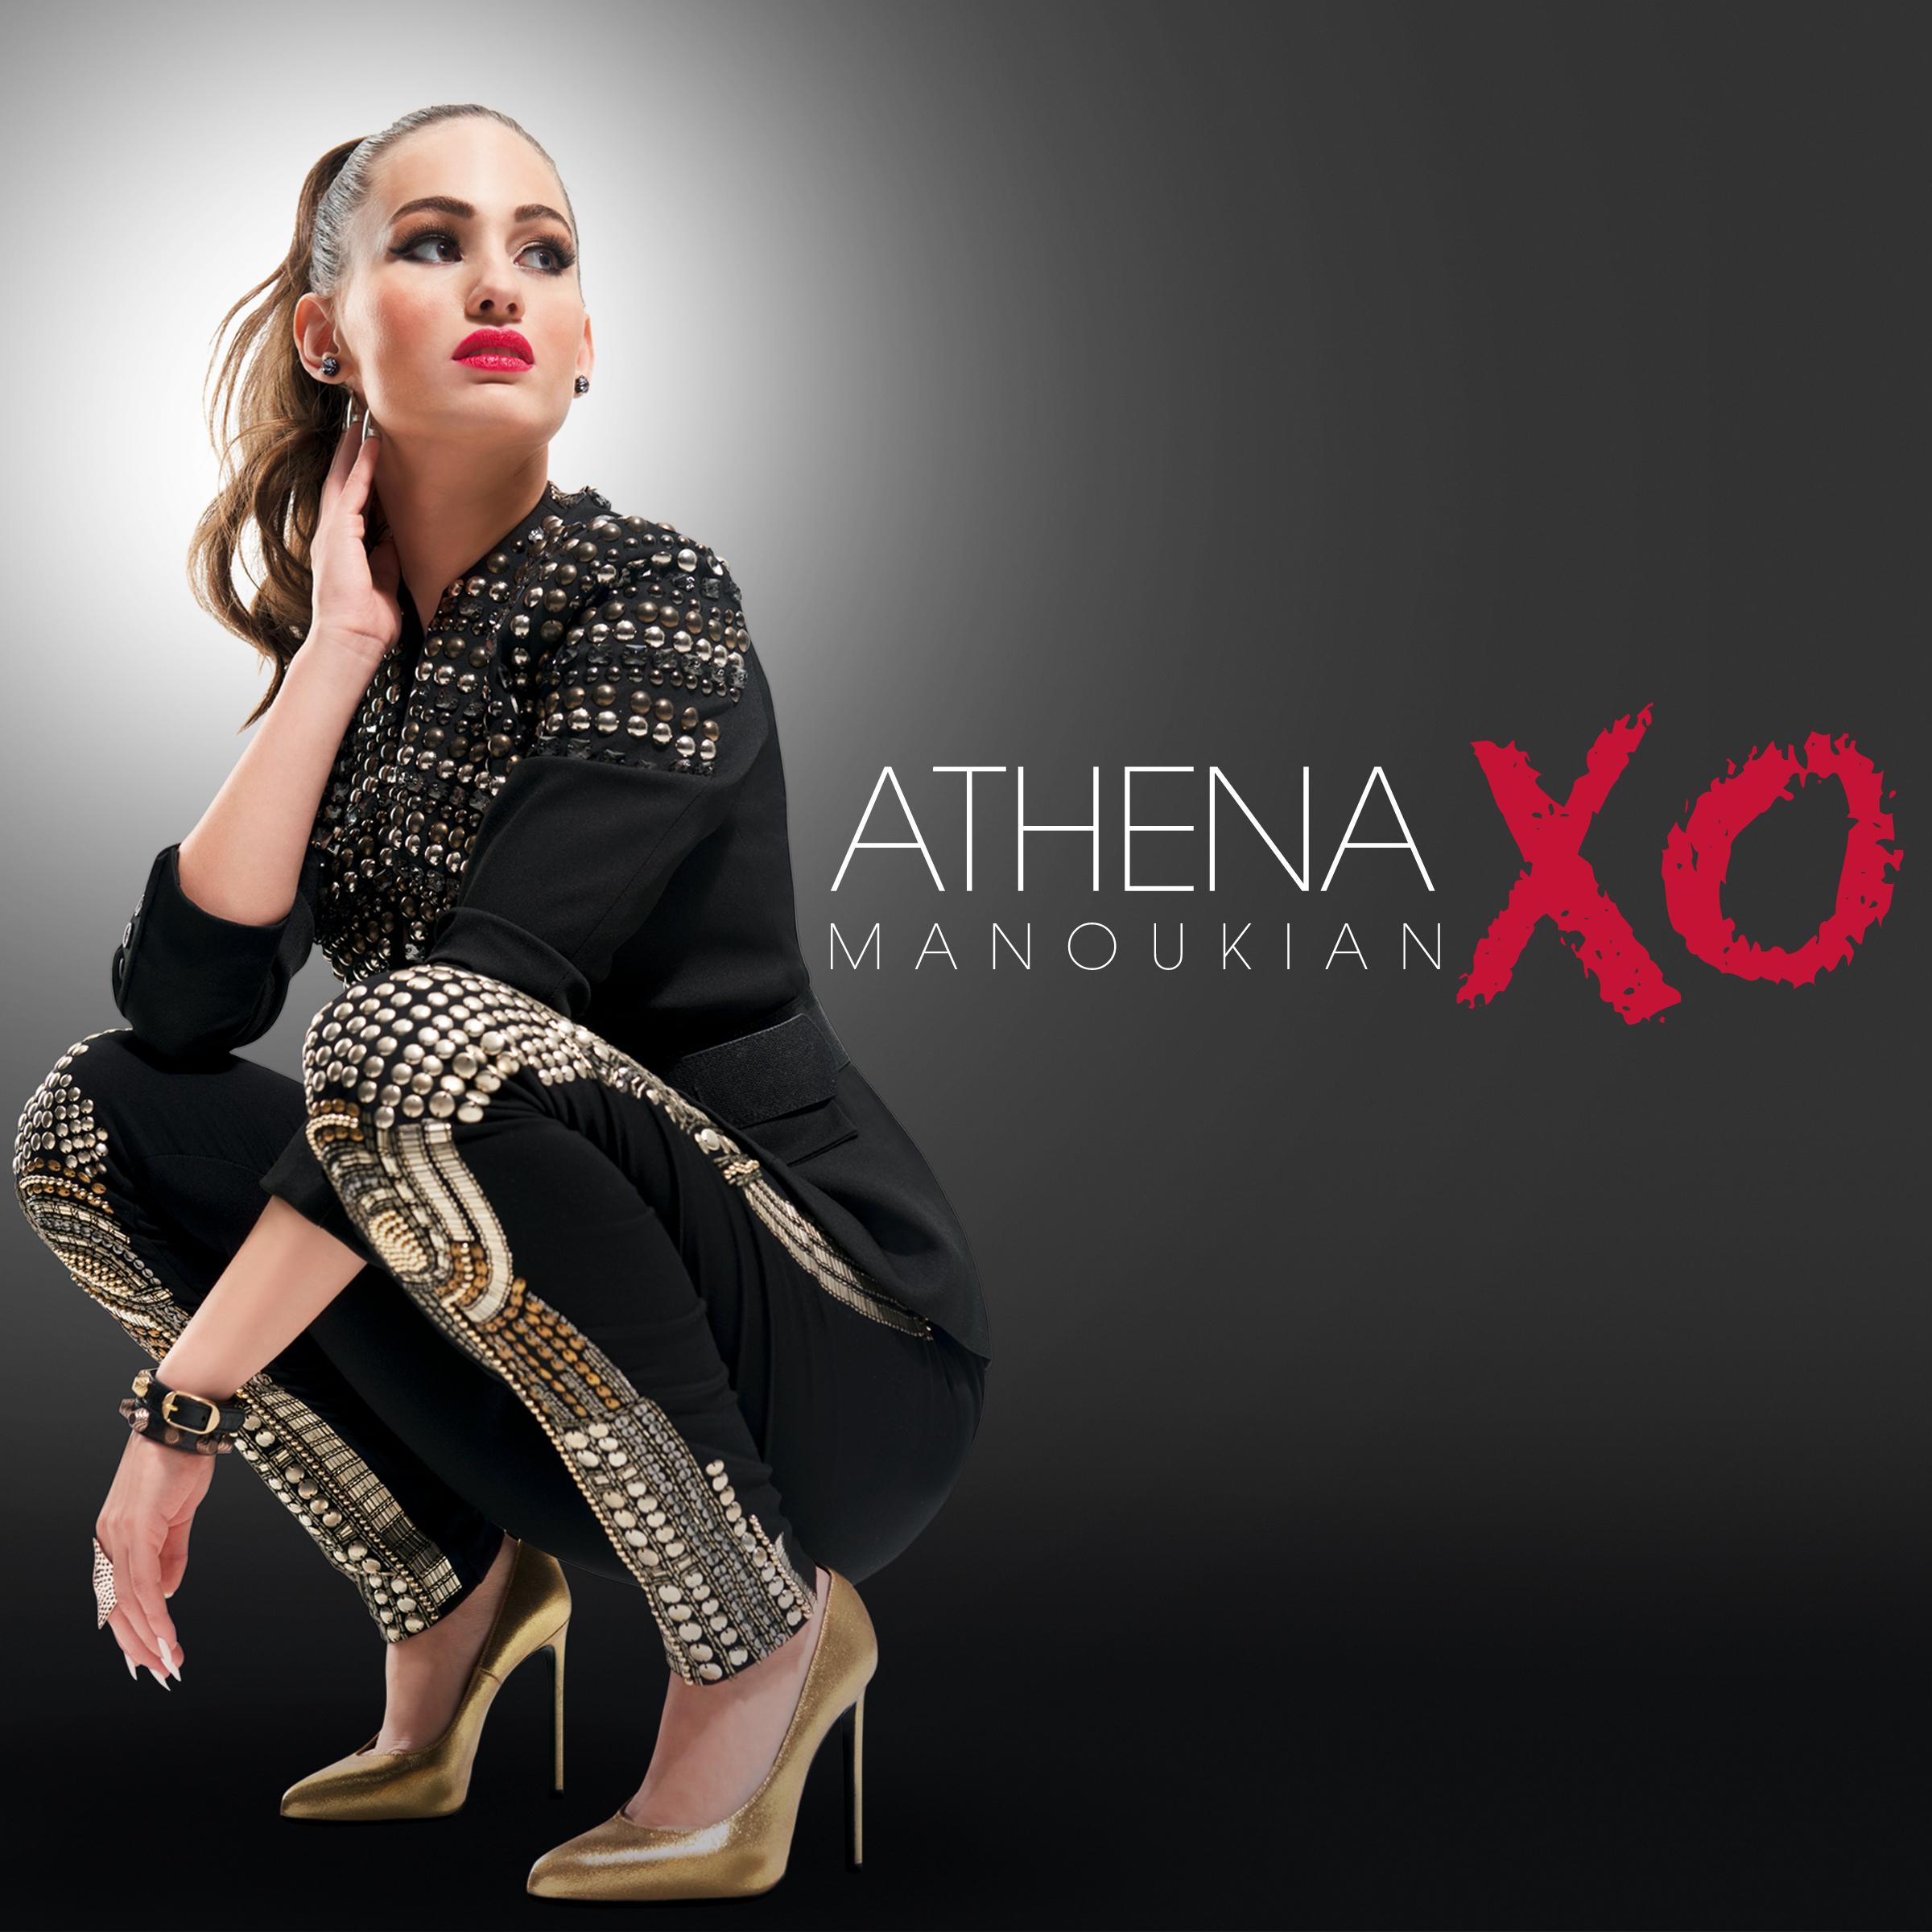 XO_Athena_Manoukian_Digital_Cover_Art.jpg